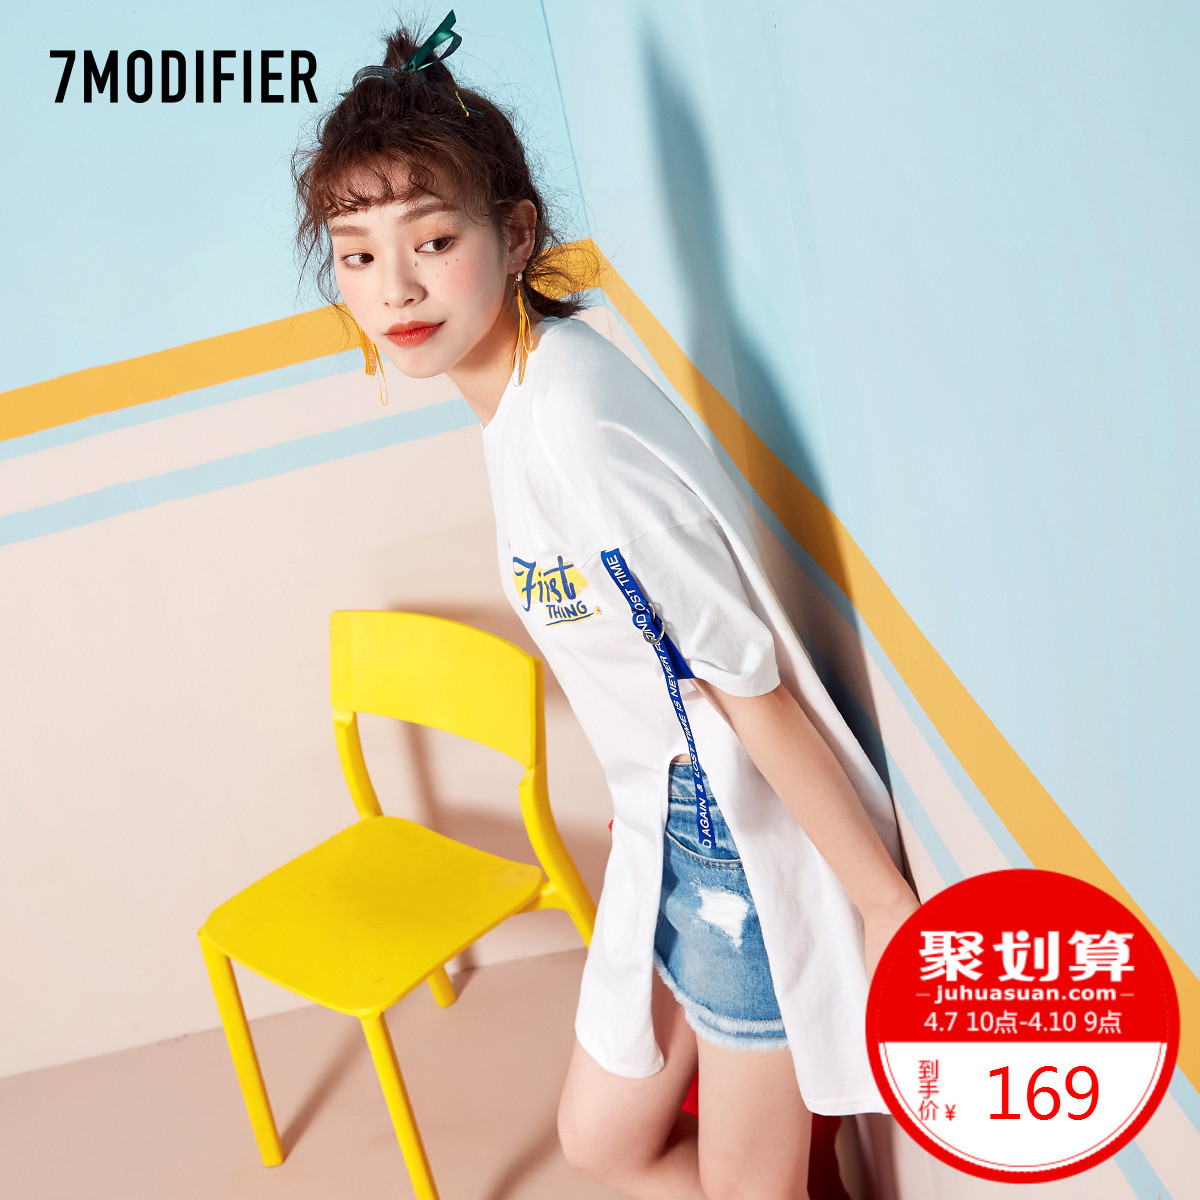 T恤学生2018夏季新品7m字母绑带印花韩版宽松高开叉中长款短袖女